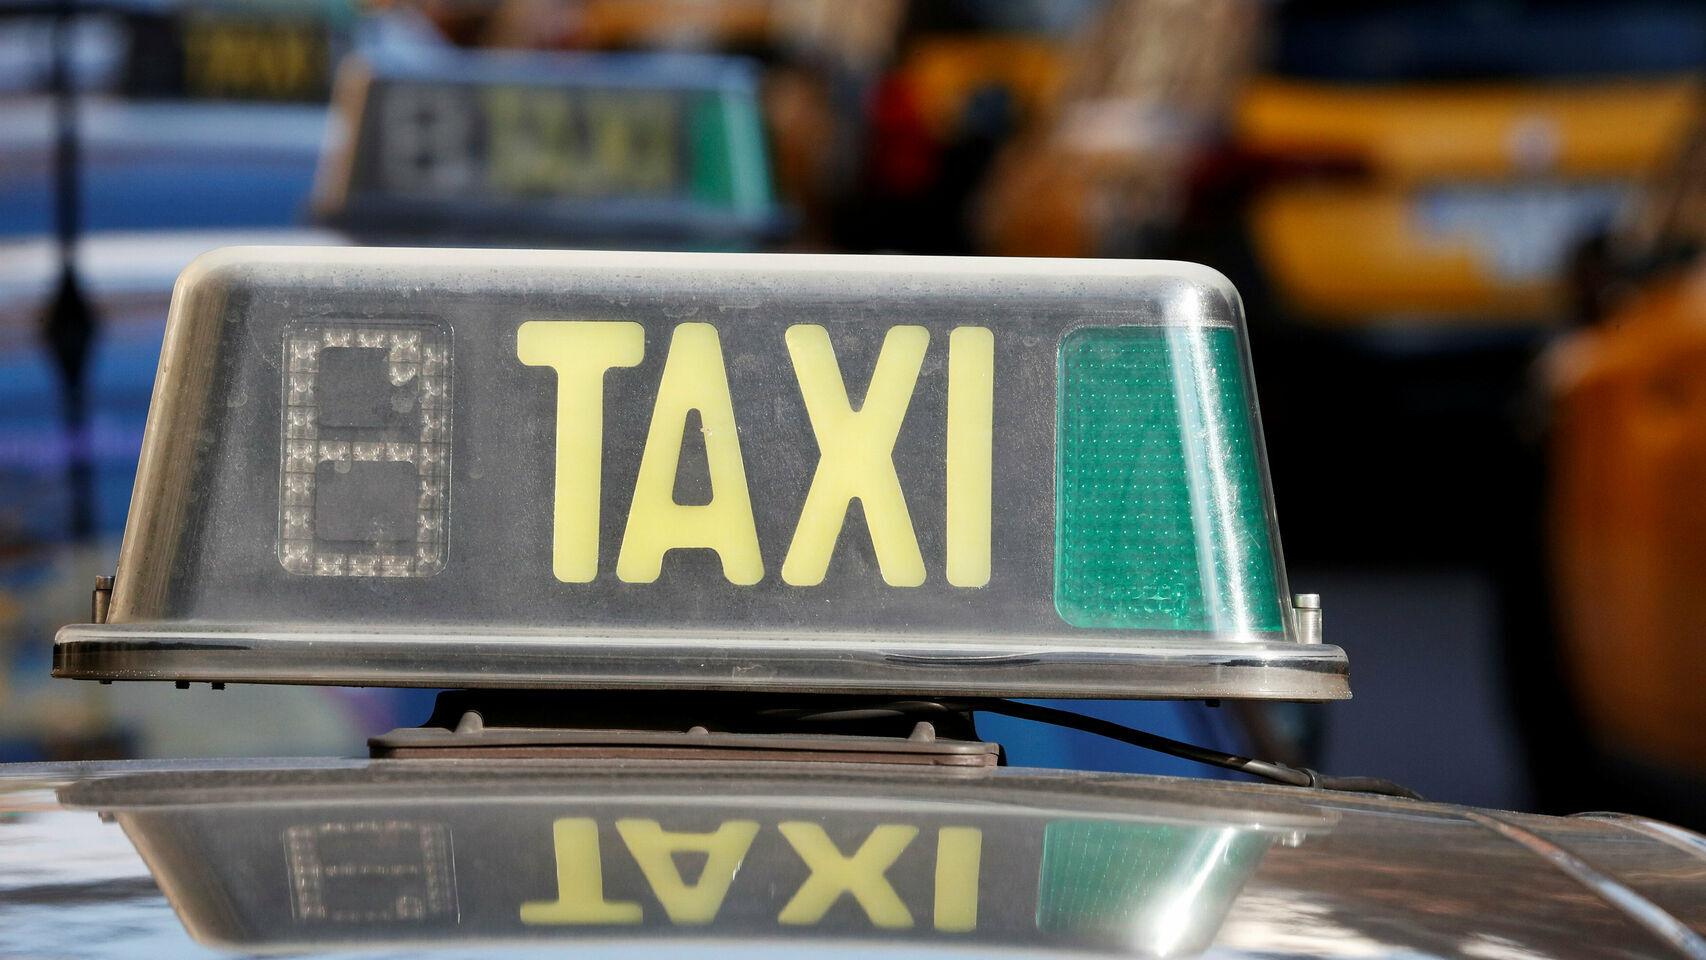 Una imagen de un taxi.